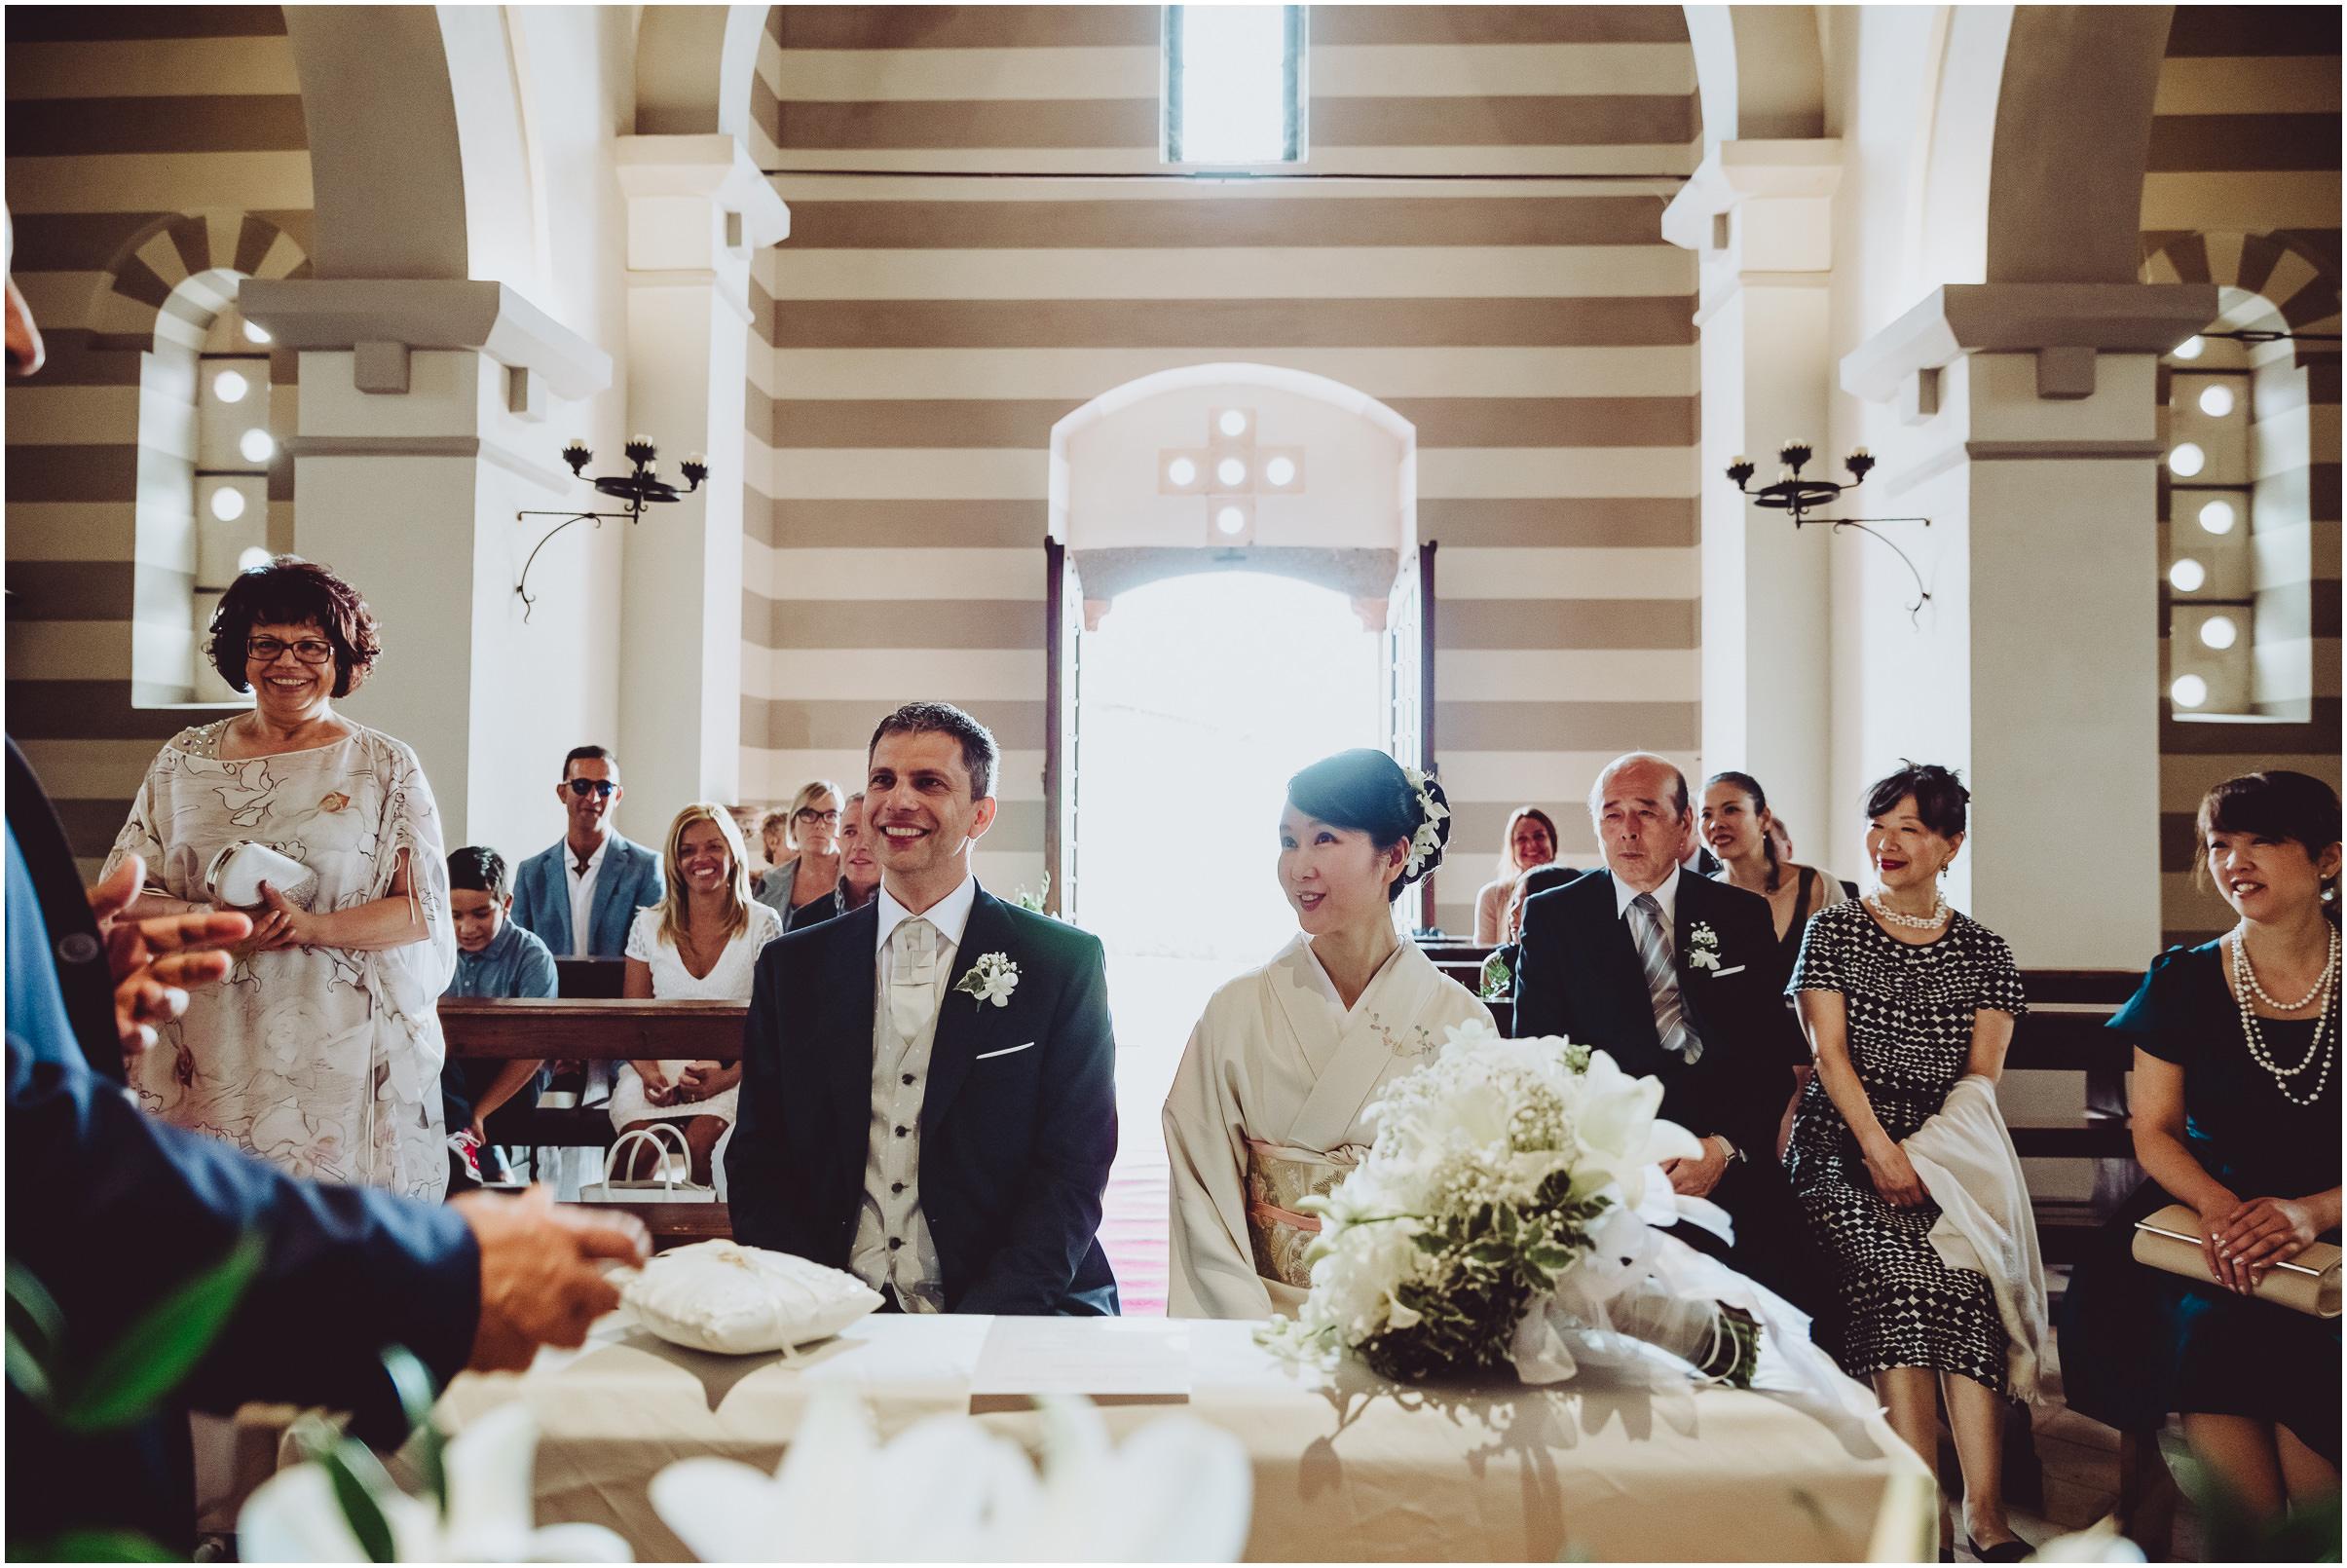 WEDDING-PHOTOGRAPHY-SARA-LORENZONI-FOTOGRAFIA-MATRIMONIO-ORVIETO-JUKA-ANTONELLO13